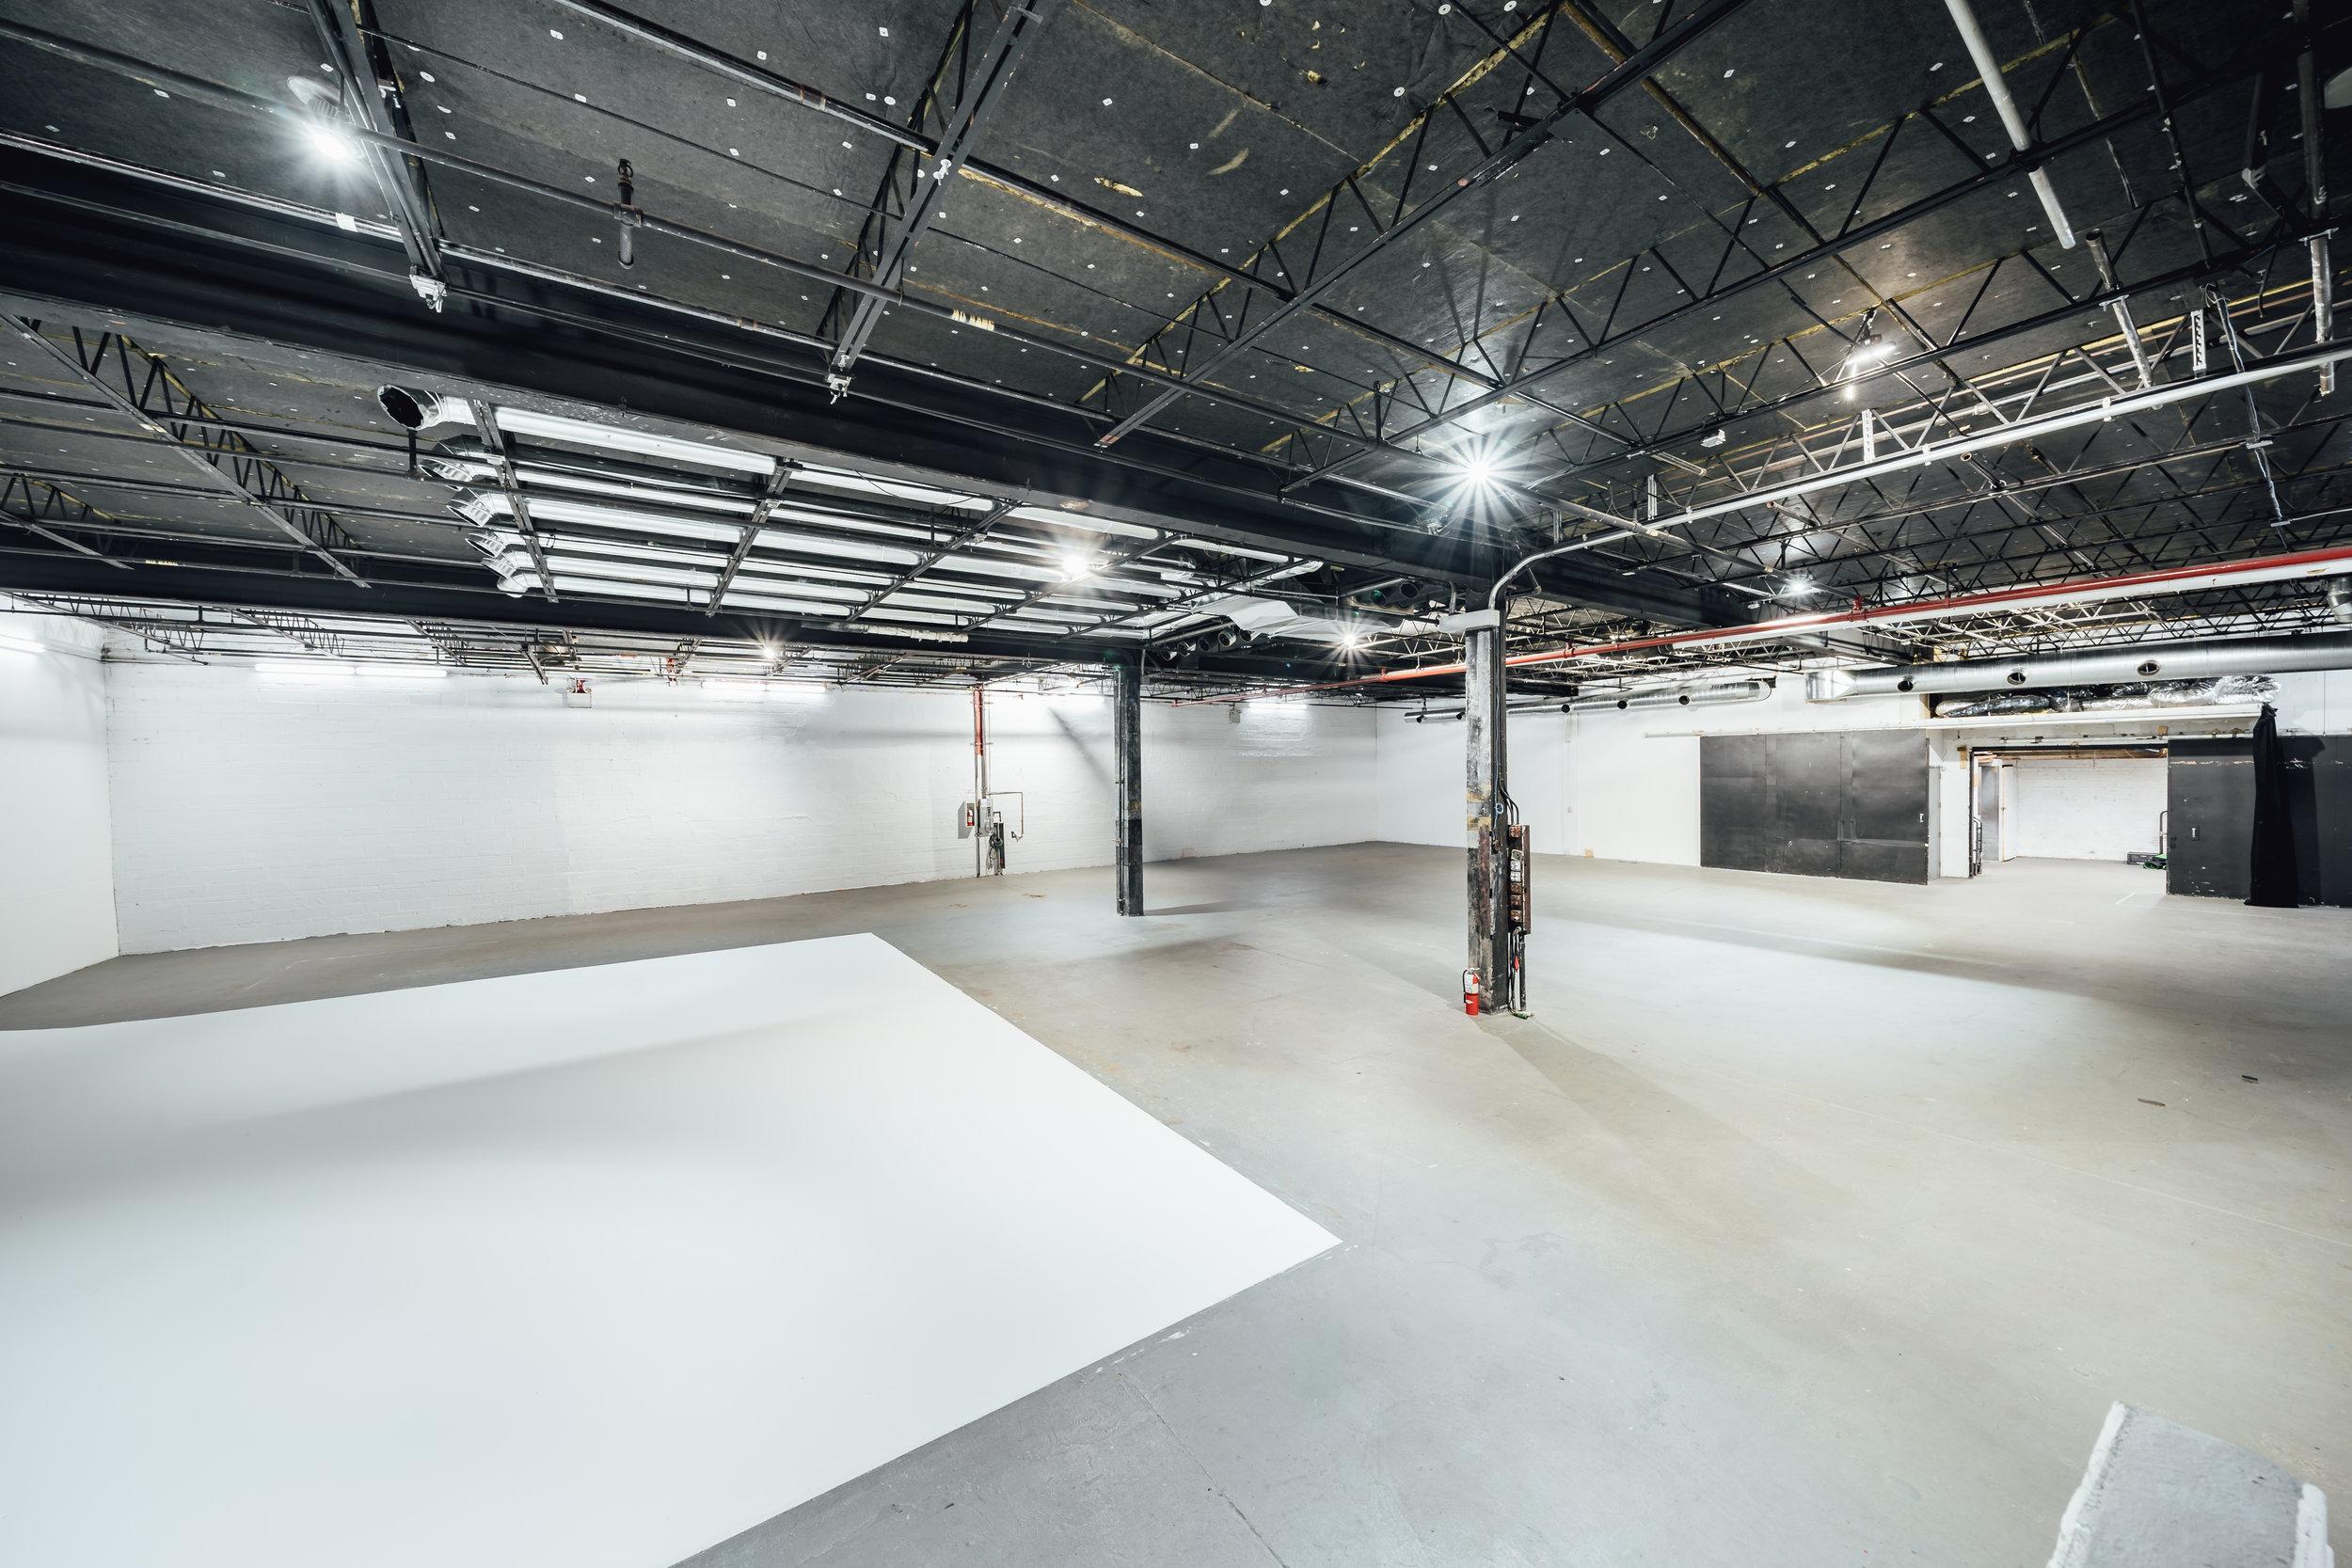 be-electric-sound-stage-quality-production-facility-brooklyn-德赢官方网址是多少film-tax-credit.jpg